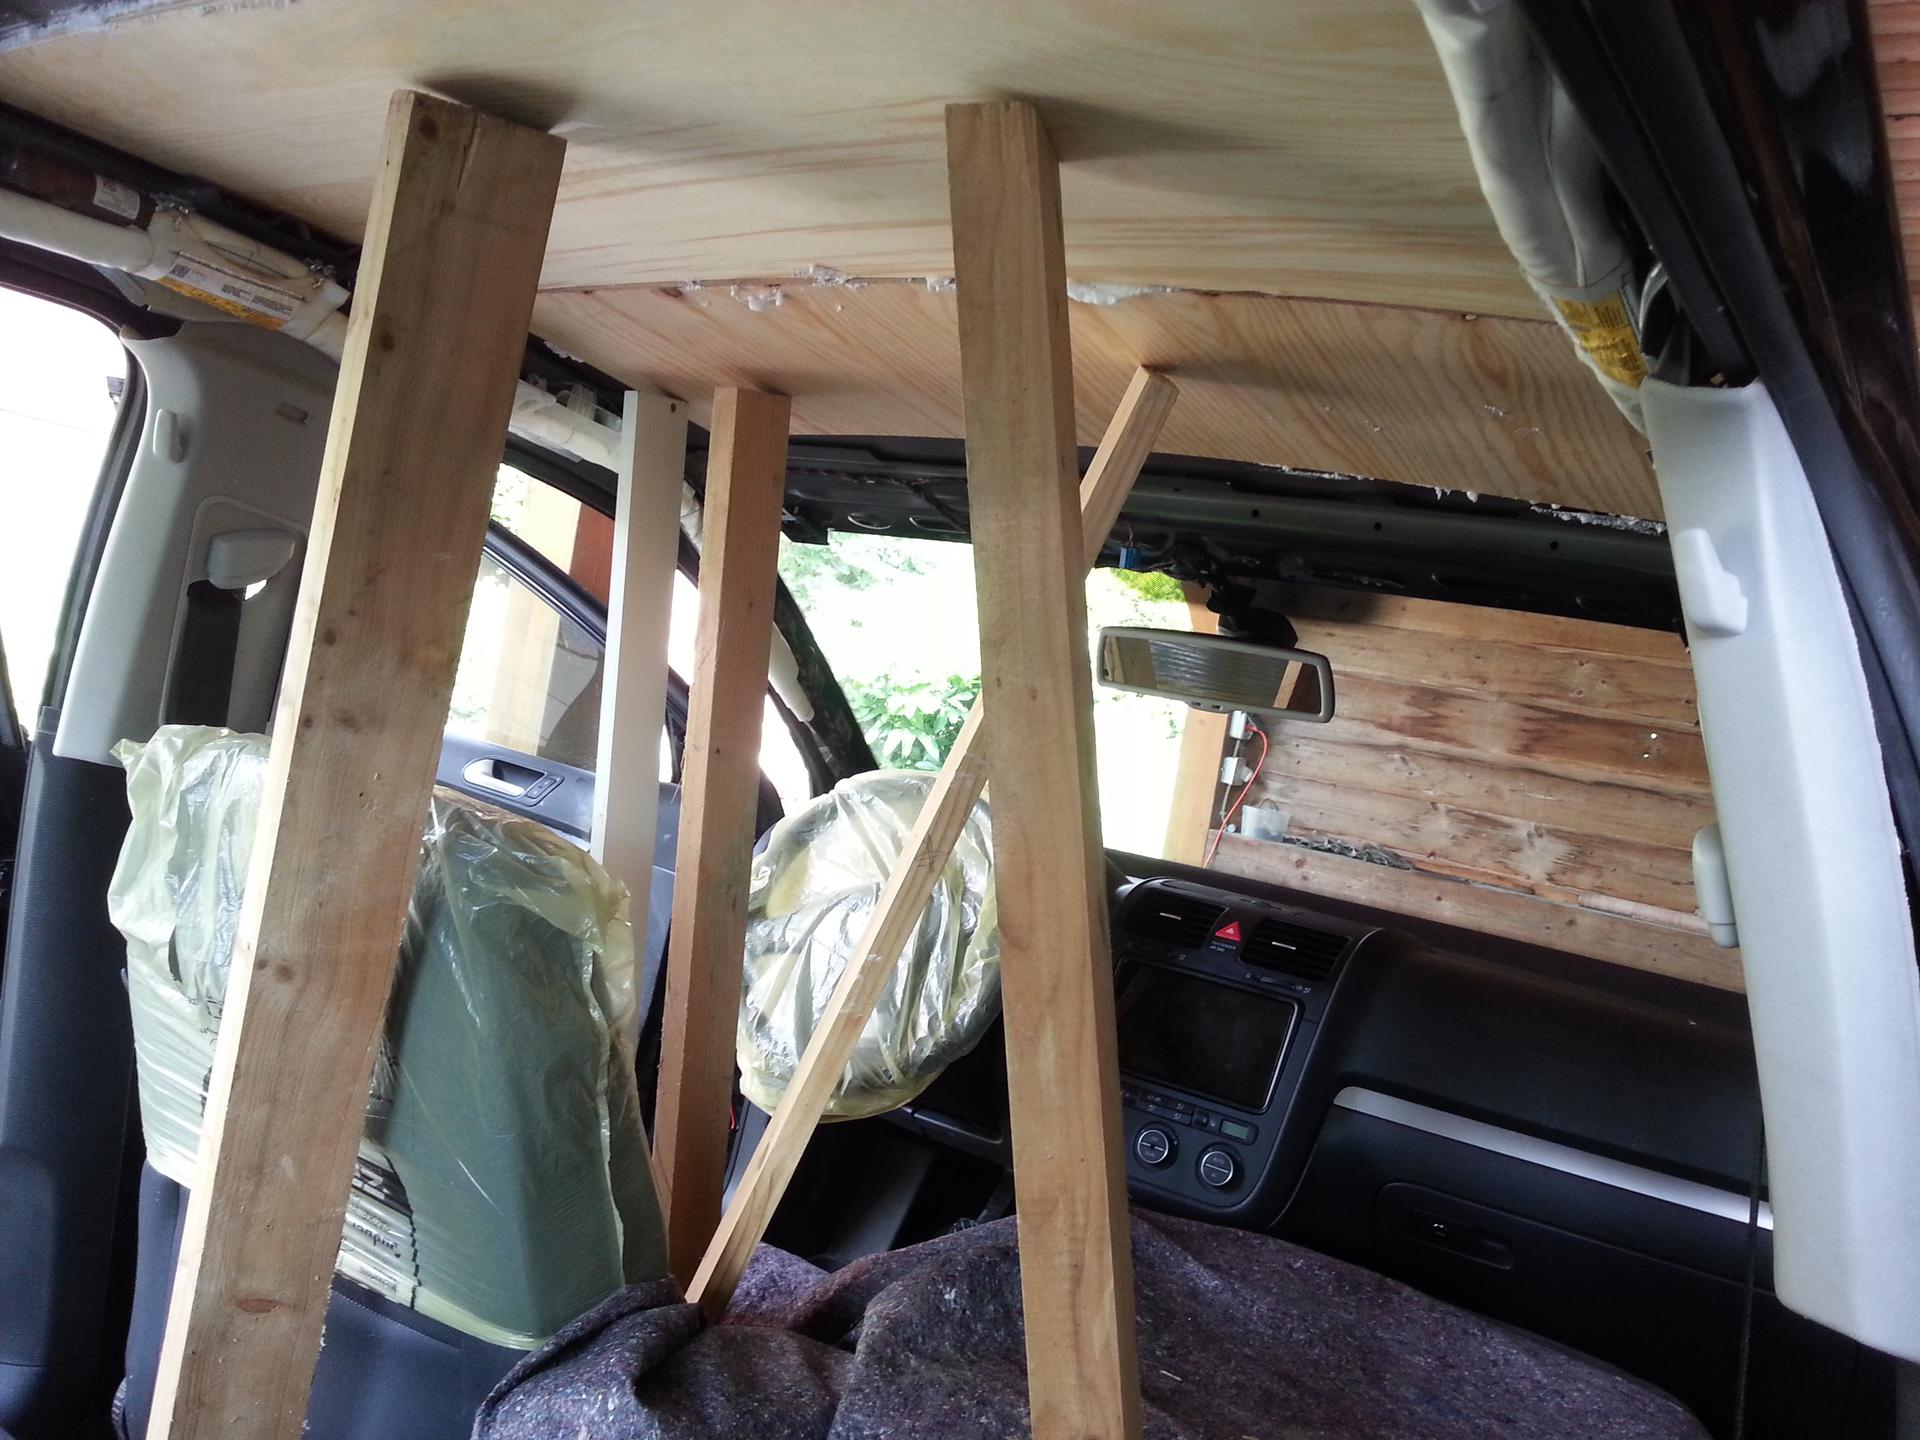 golf v variant dach und kofferraum d mmen dach d mmen golf kofferraum variant hifi forum. Black Bedroom Furniture Sets. Home Design Ideas